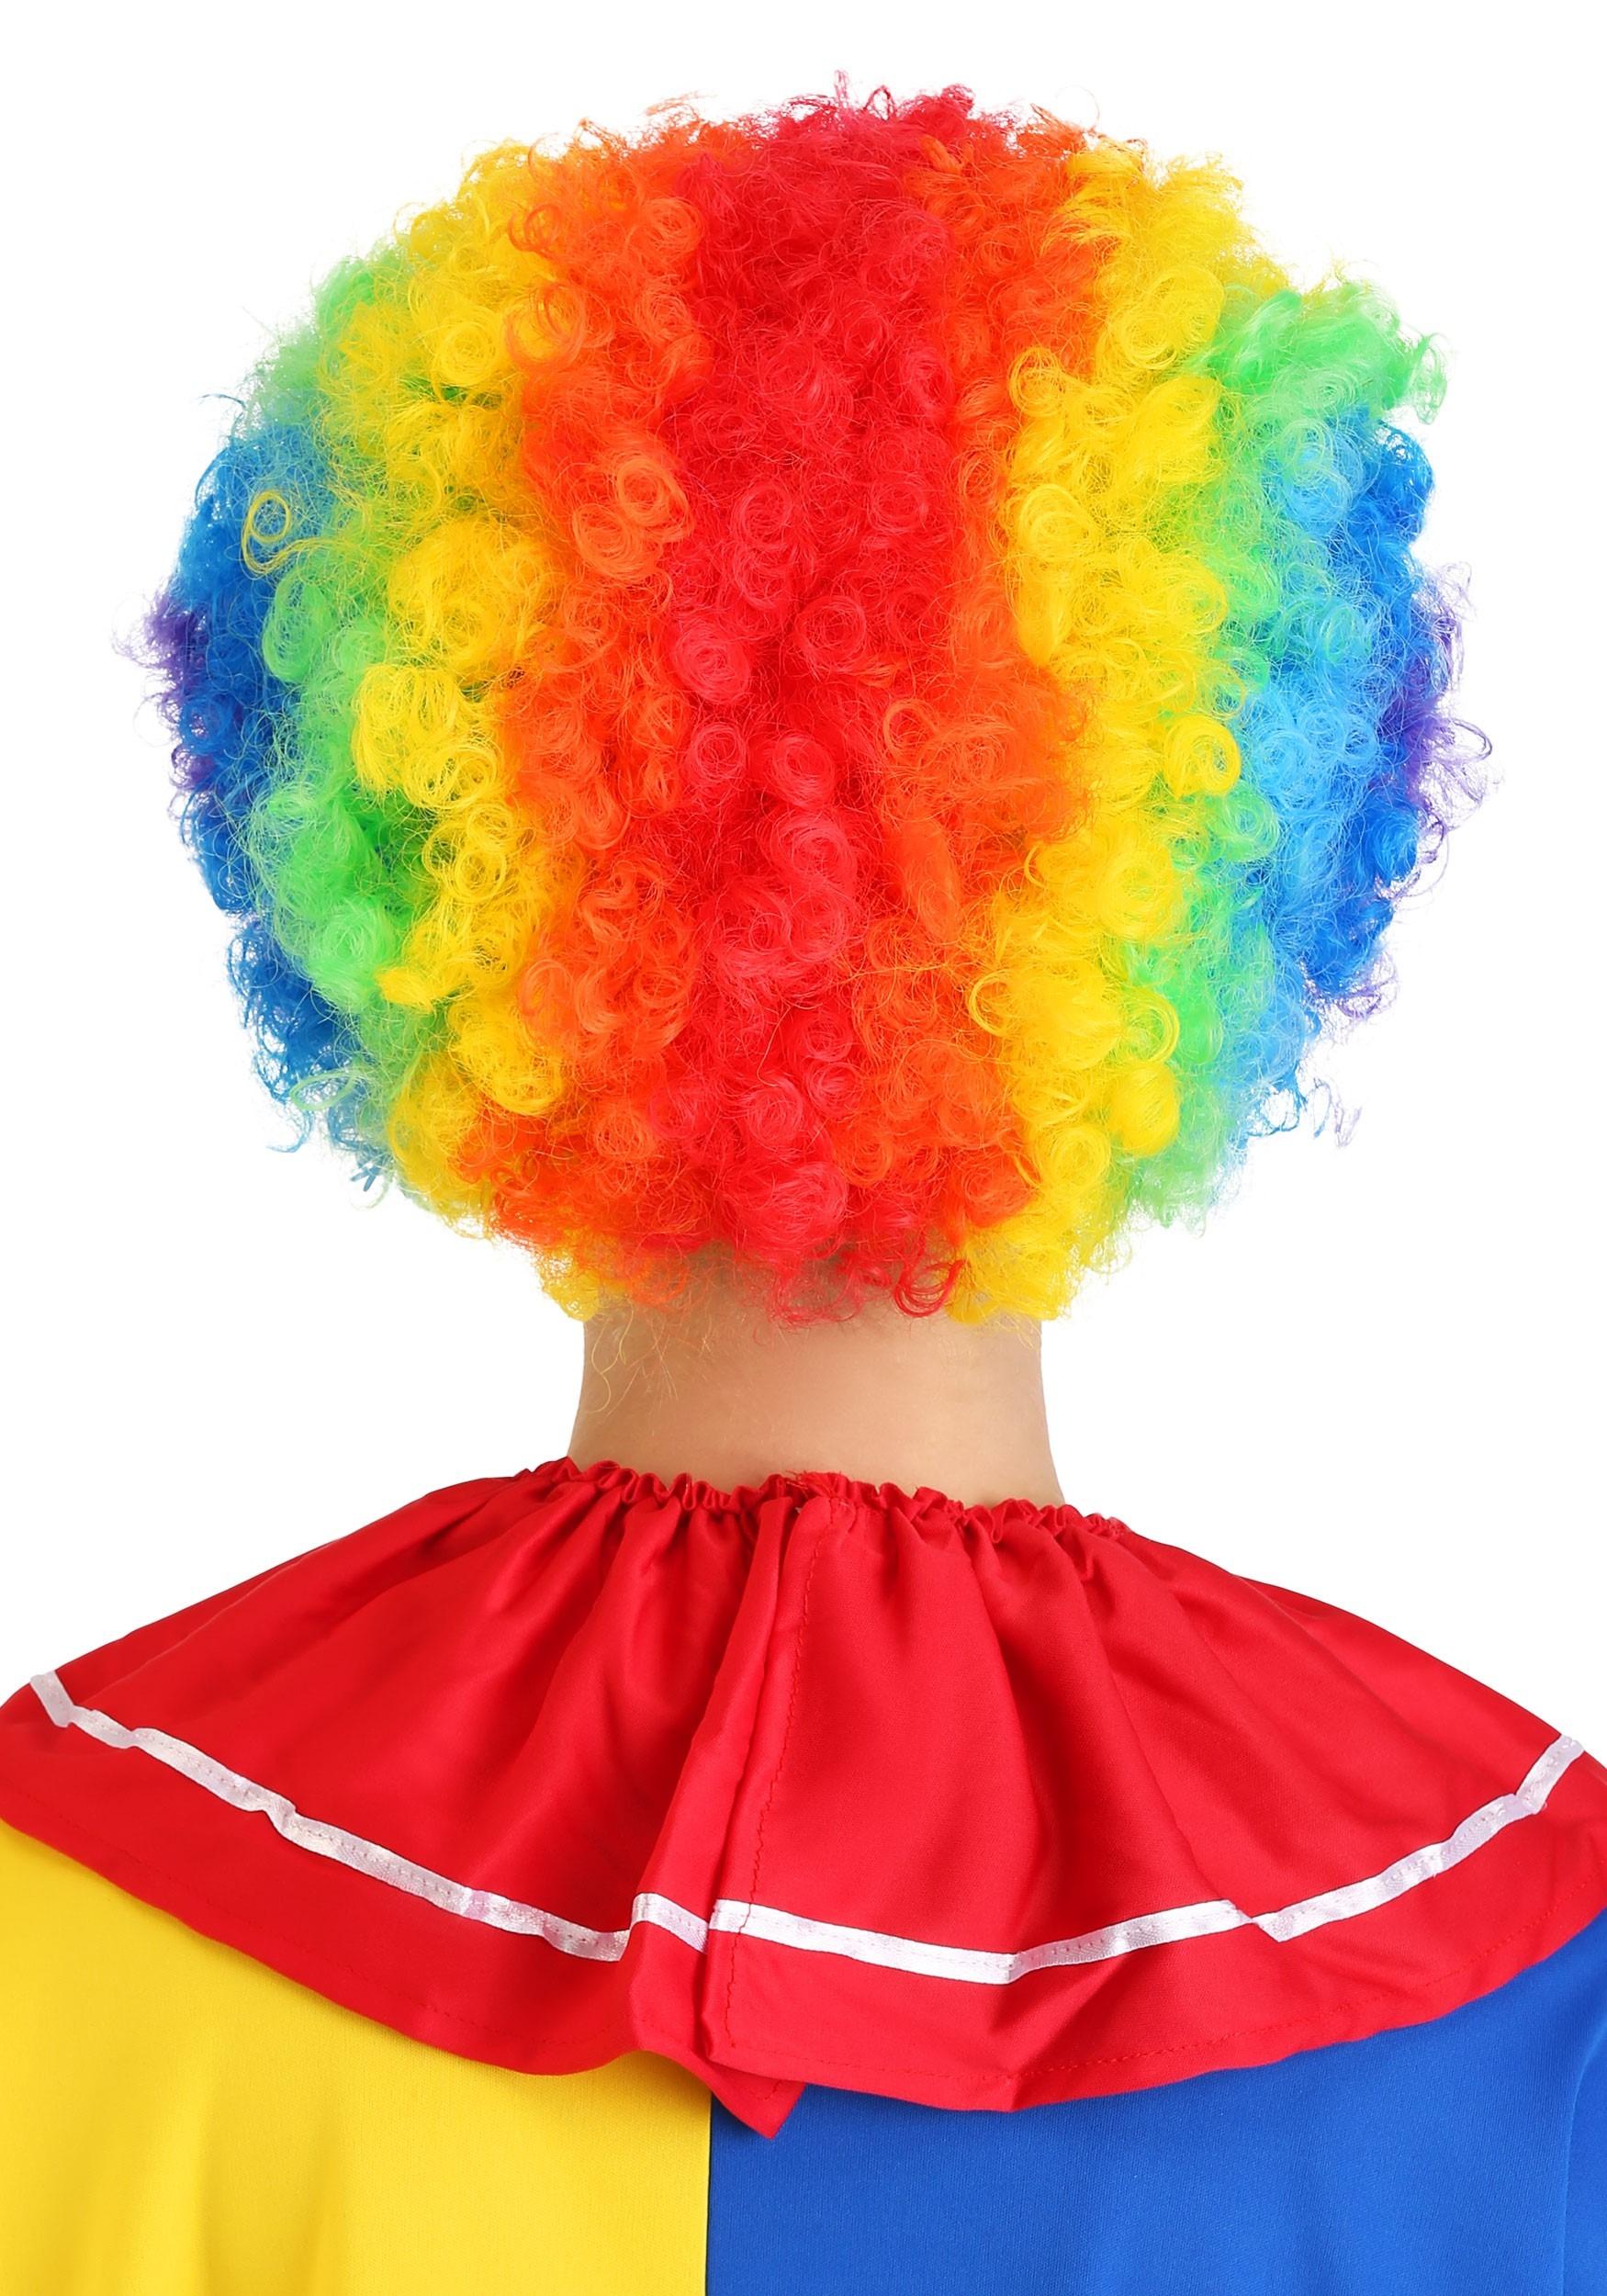 Rainbow Clown Wig Party Costume Clown Wig